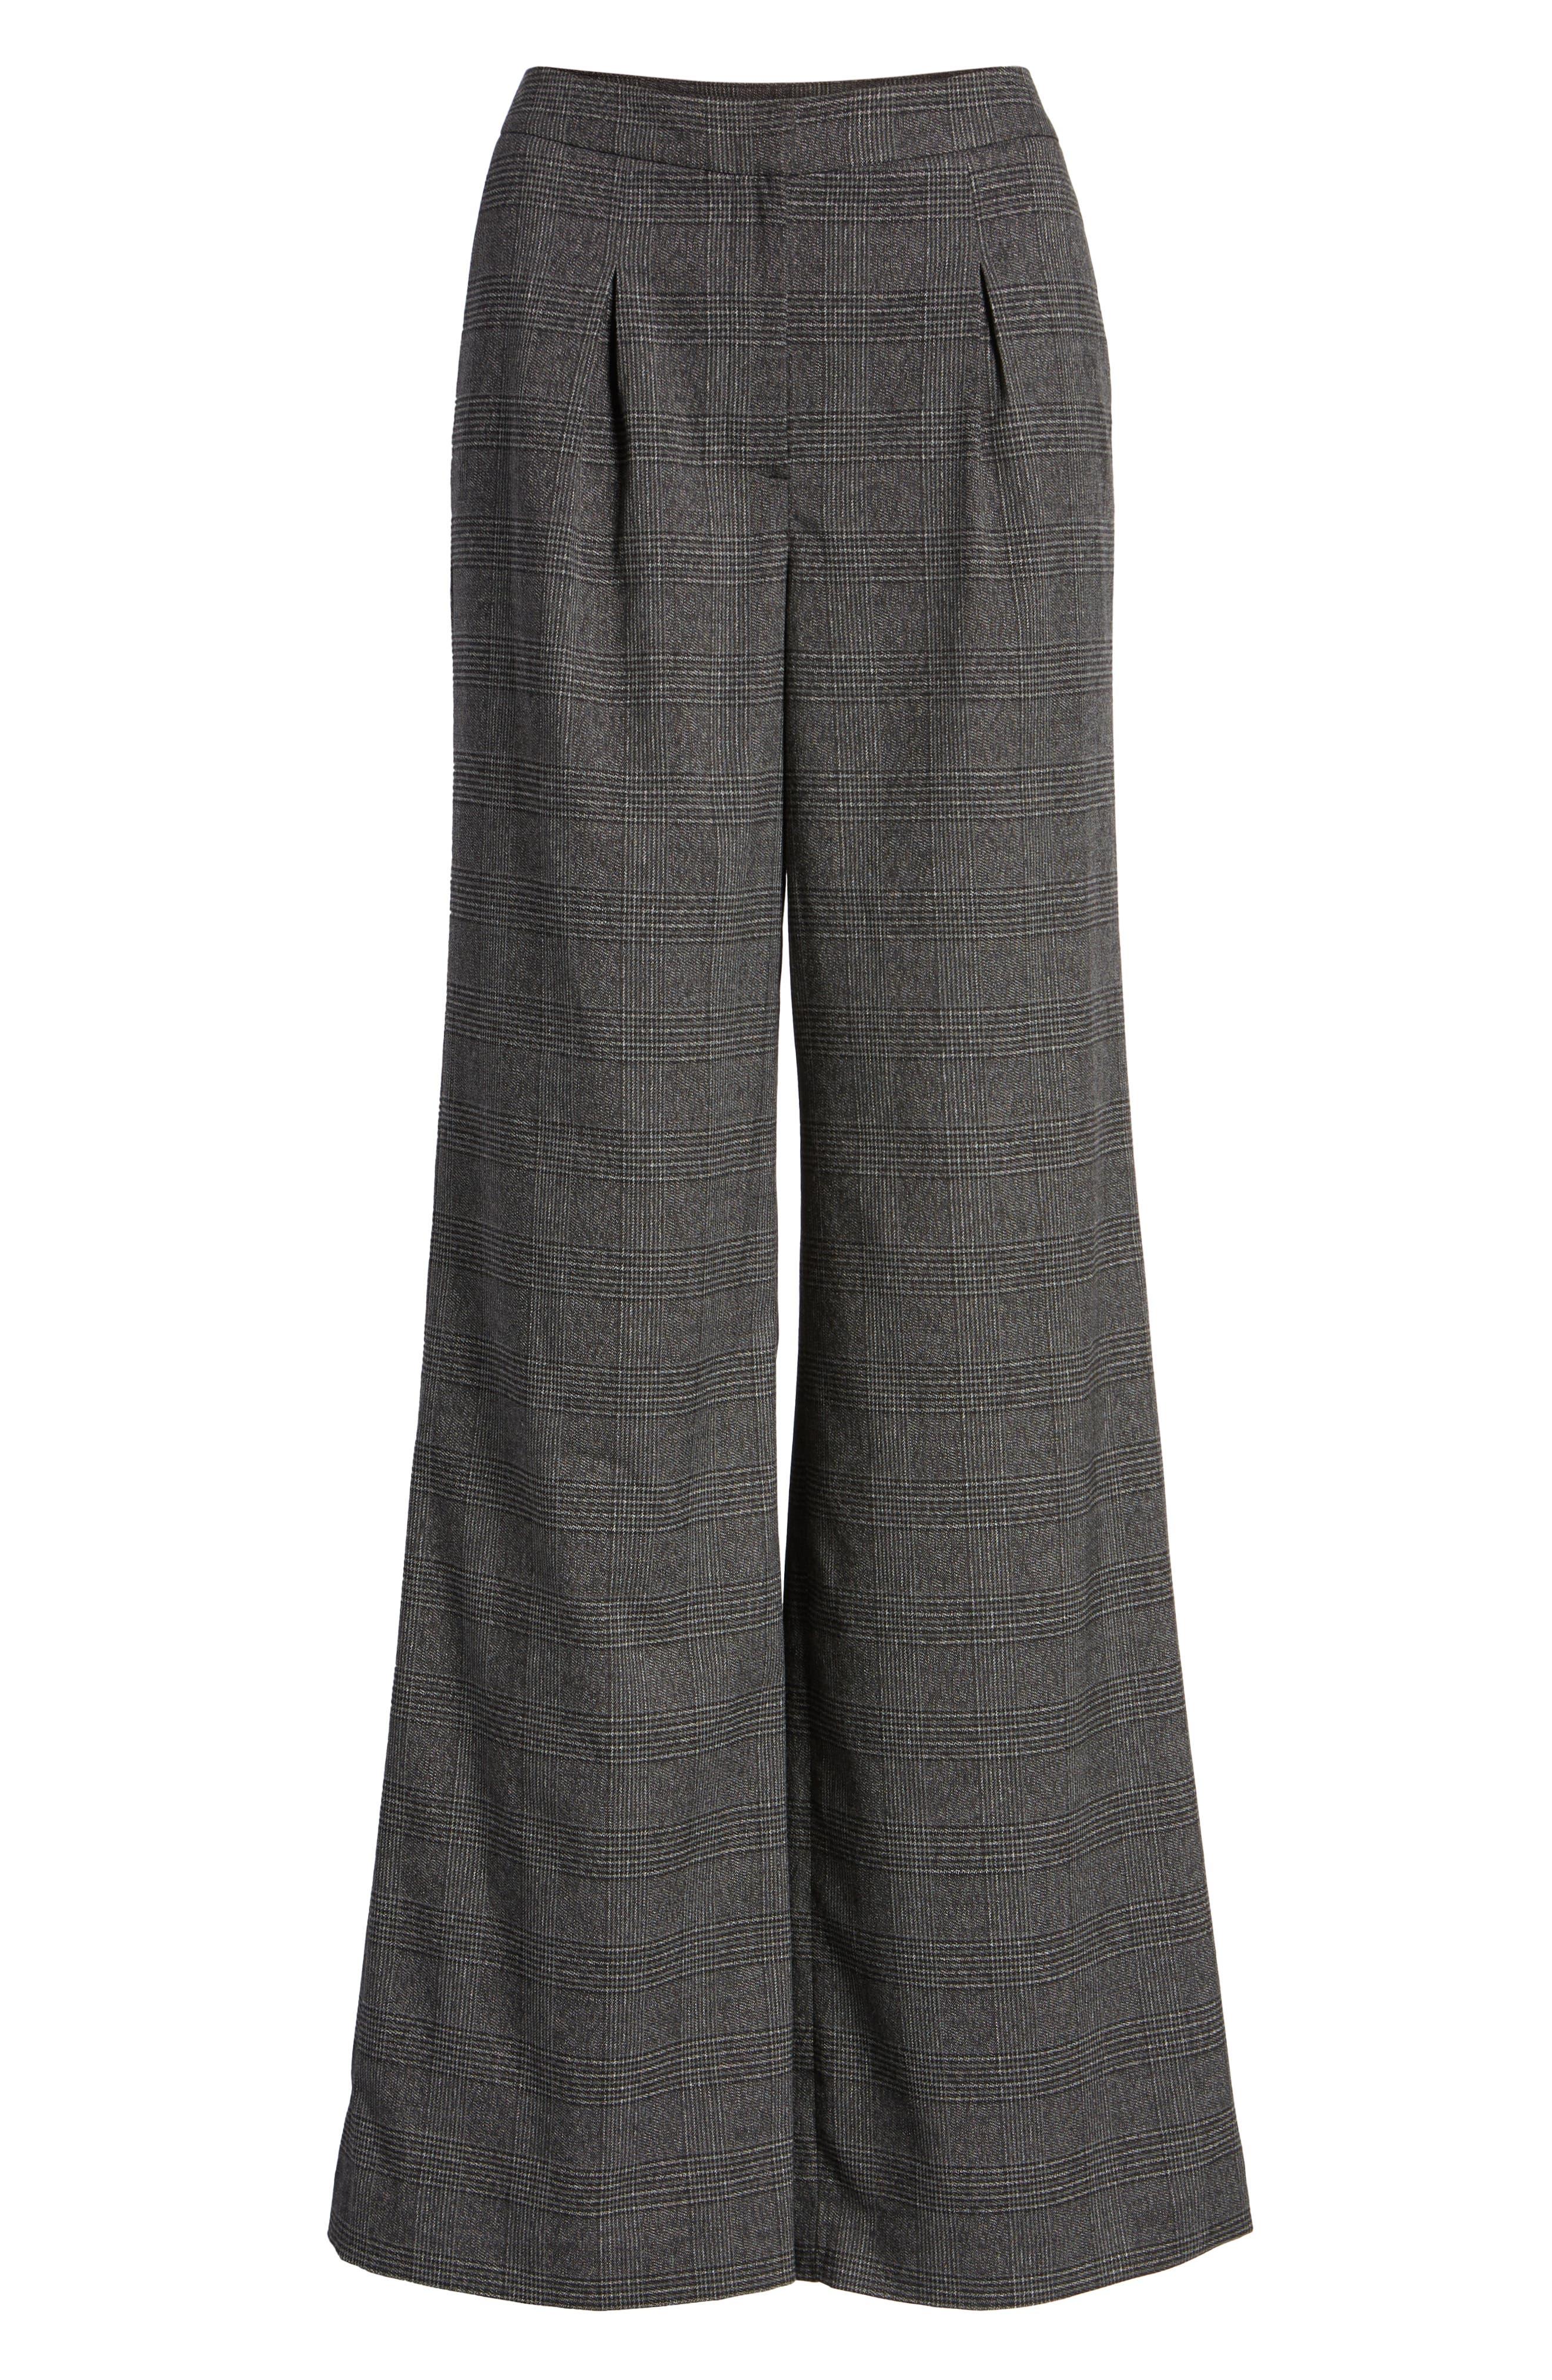 Plaid High Waist Wide Leg Pants,                             Alternate thumbnail 6, color,                             030